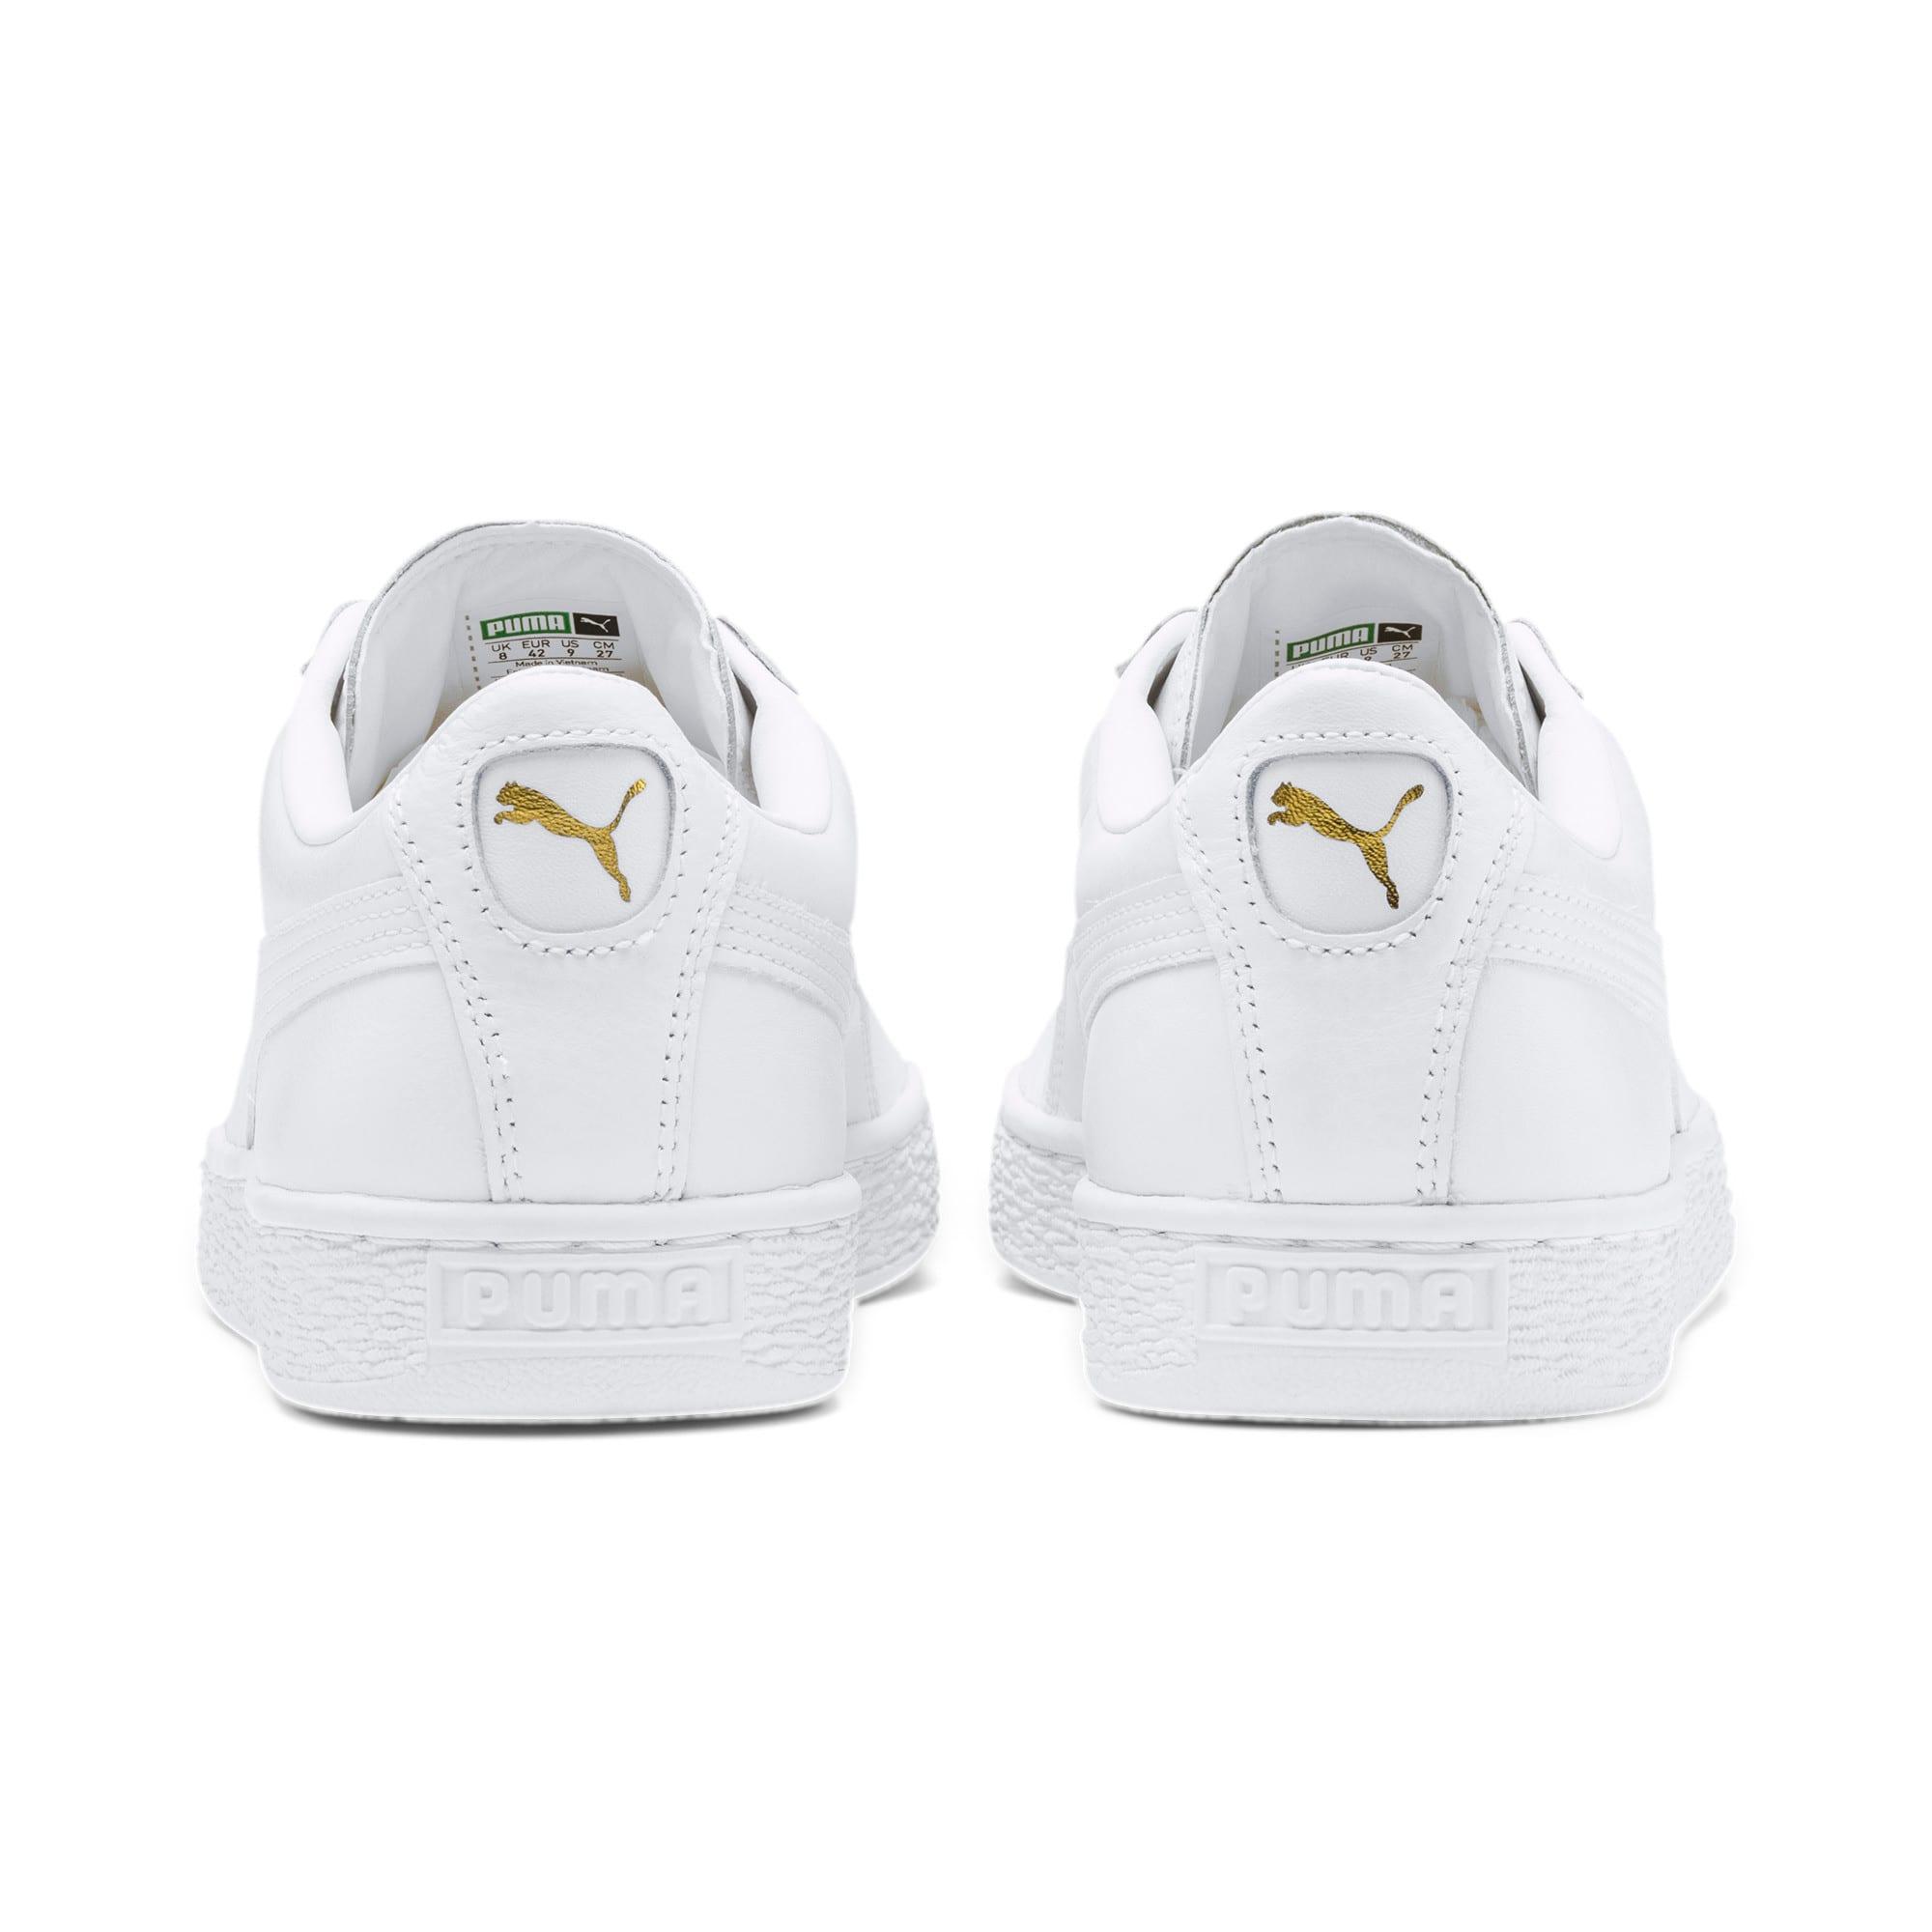 Thumbnail 8 of Basket Classic LFS schoenen voor heren, white-white, medium